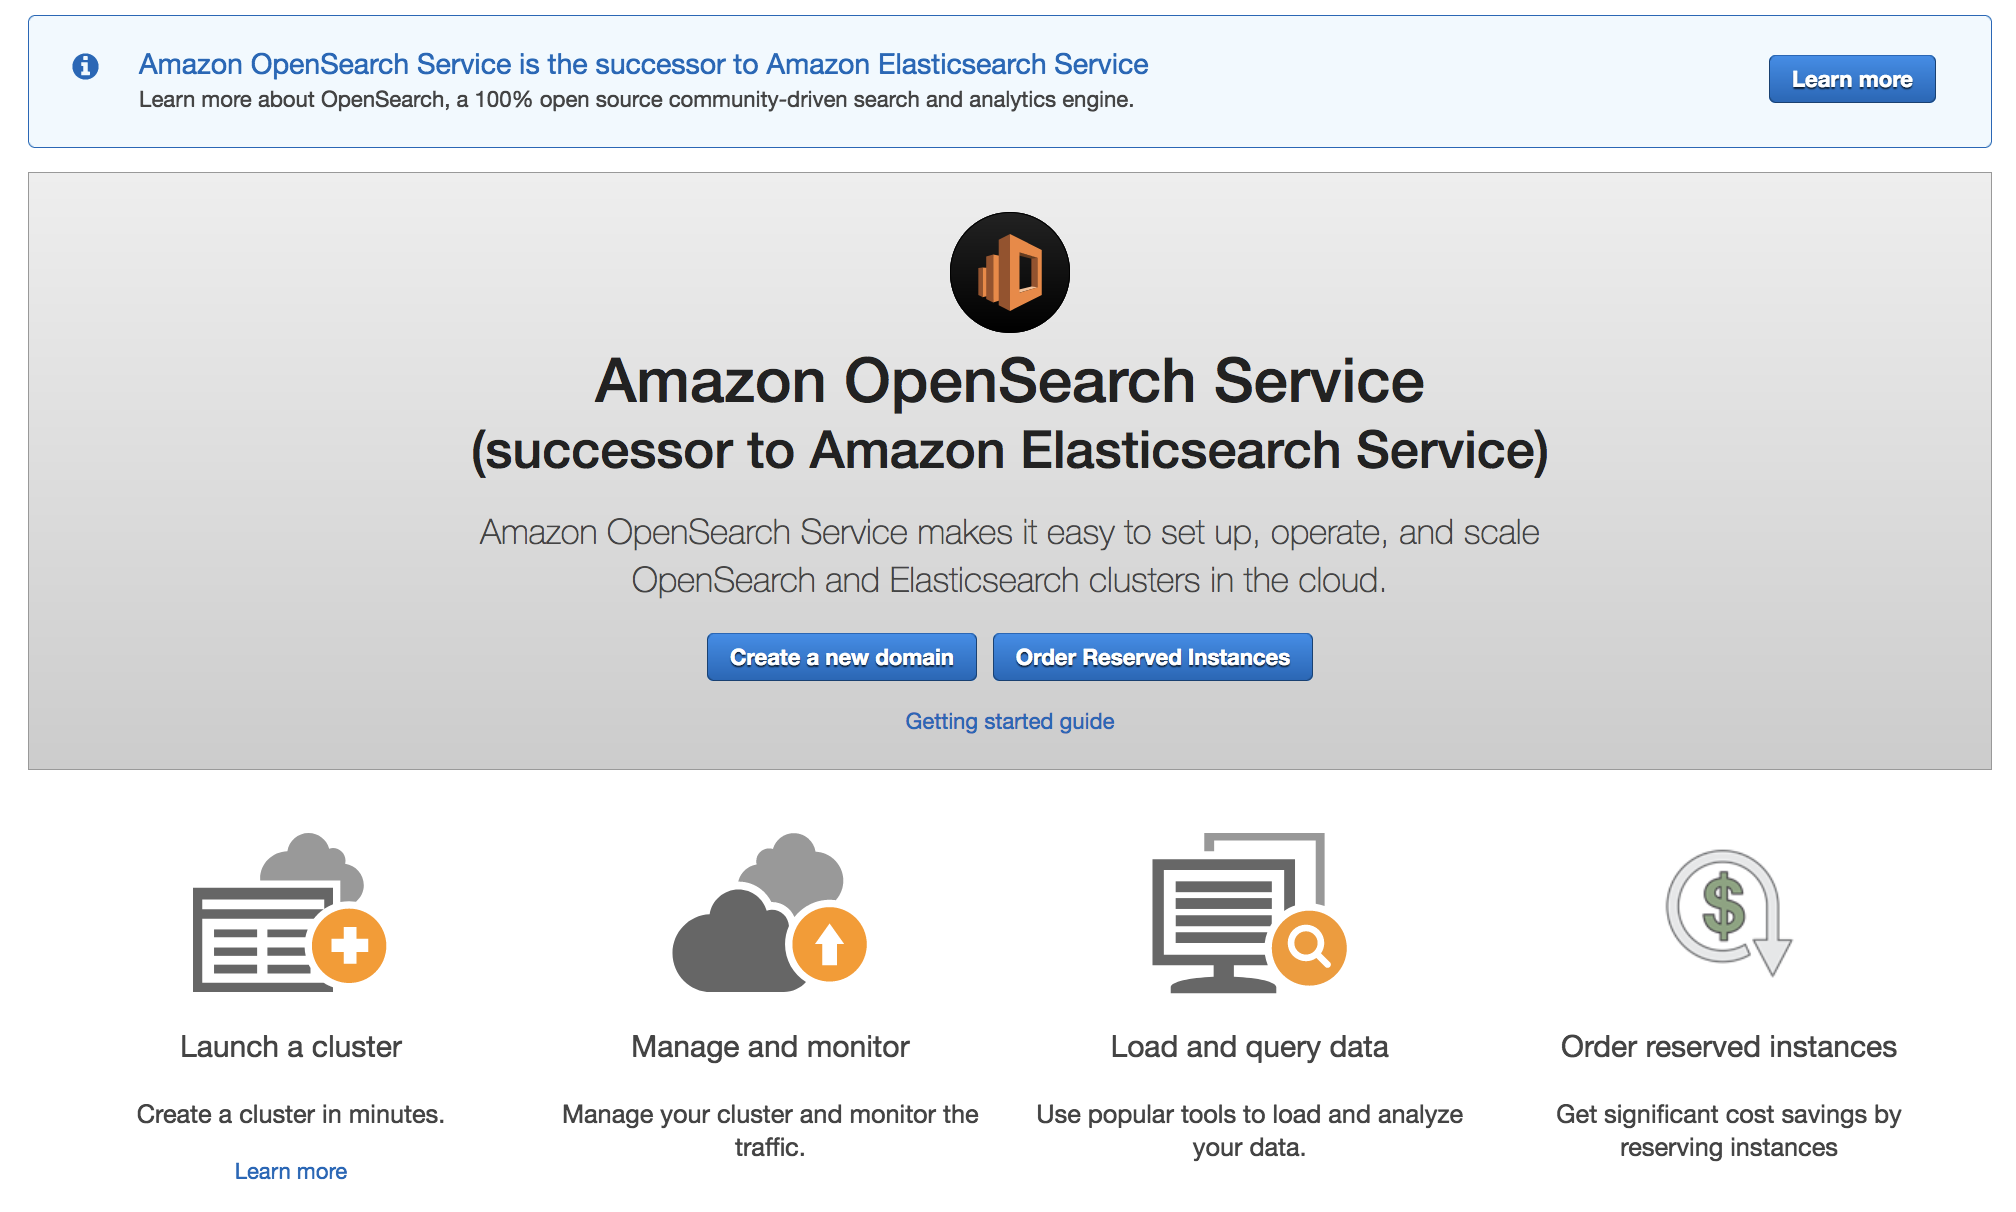 Amazon Elasticsearch Service Is Now Amazon OpenSearch Service and Supports OpenSearch 1.0